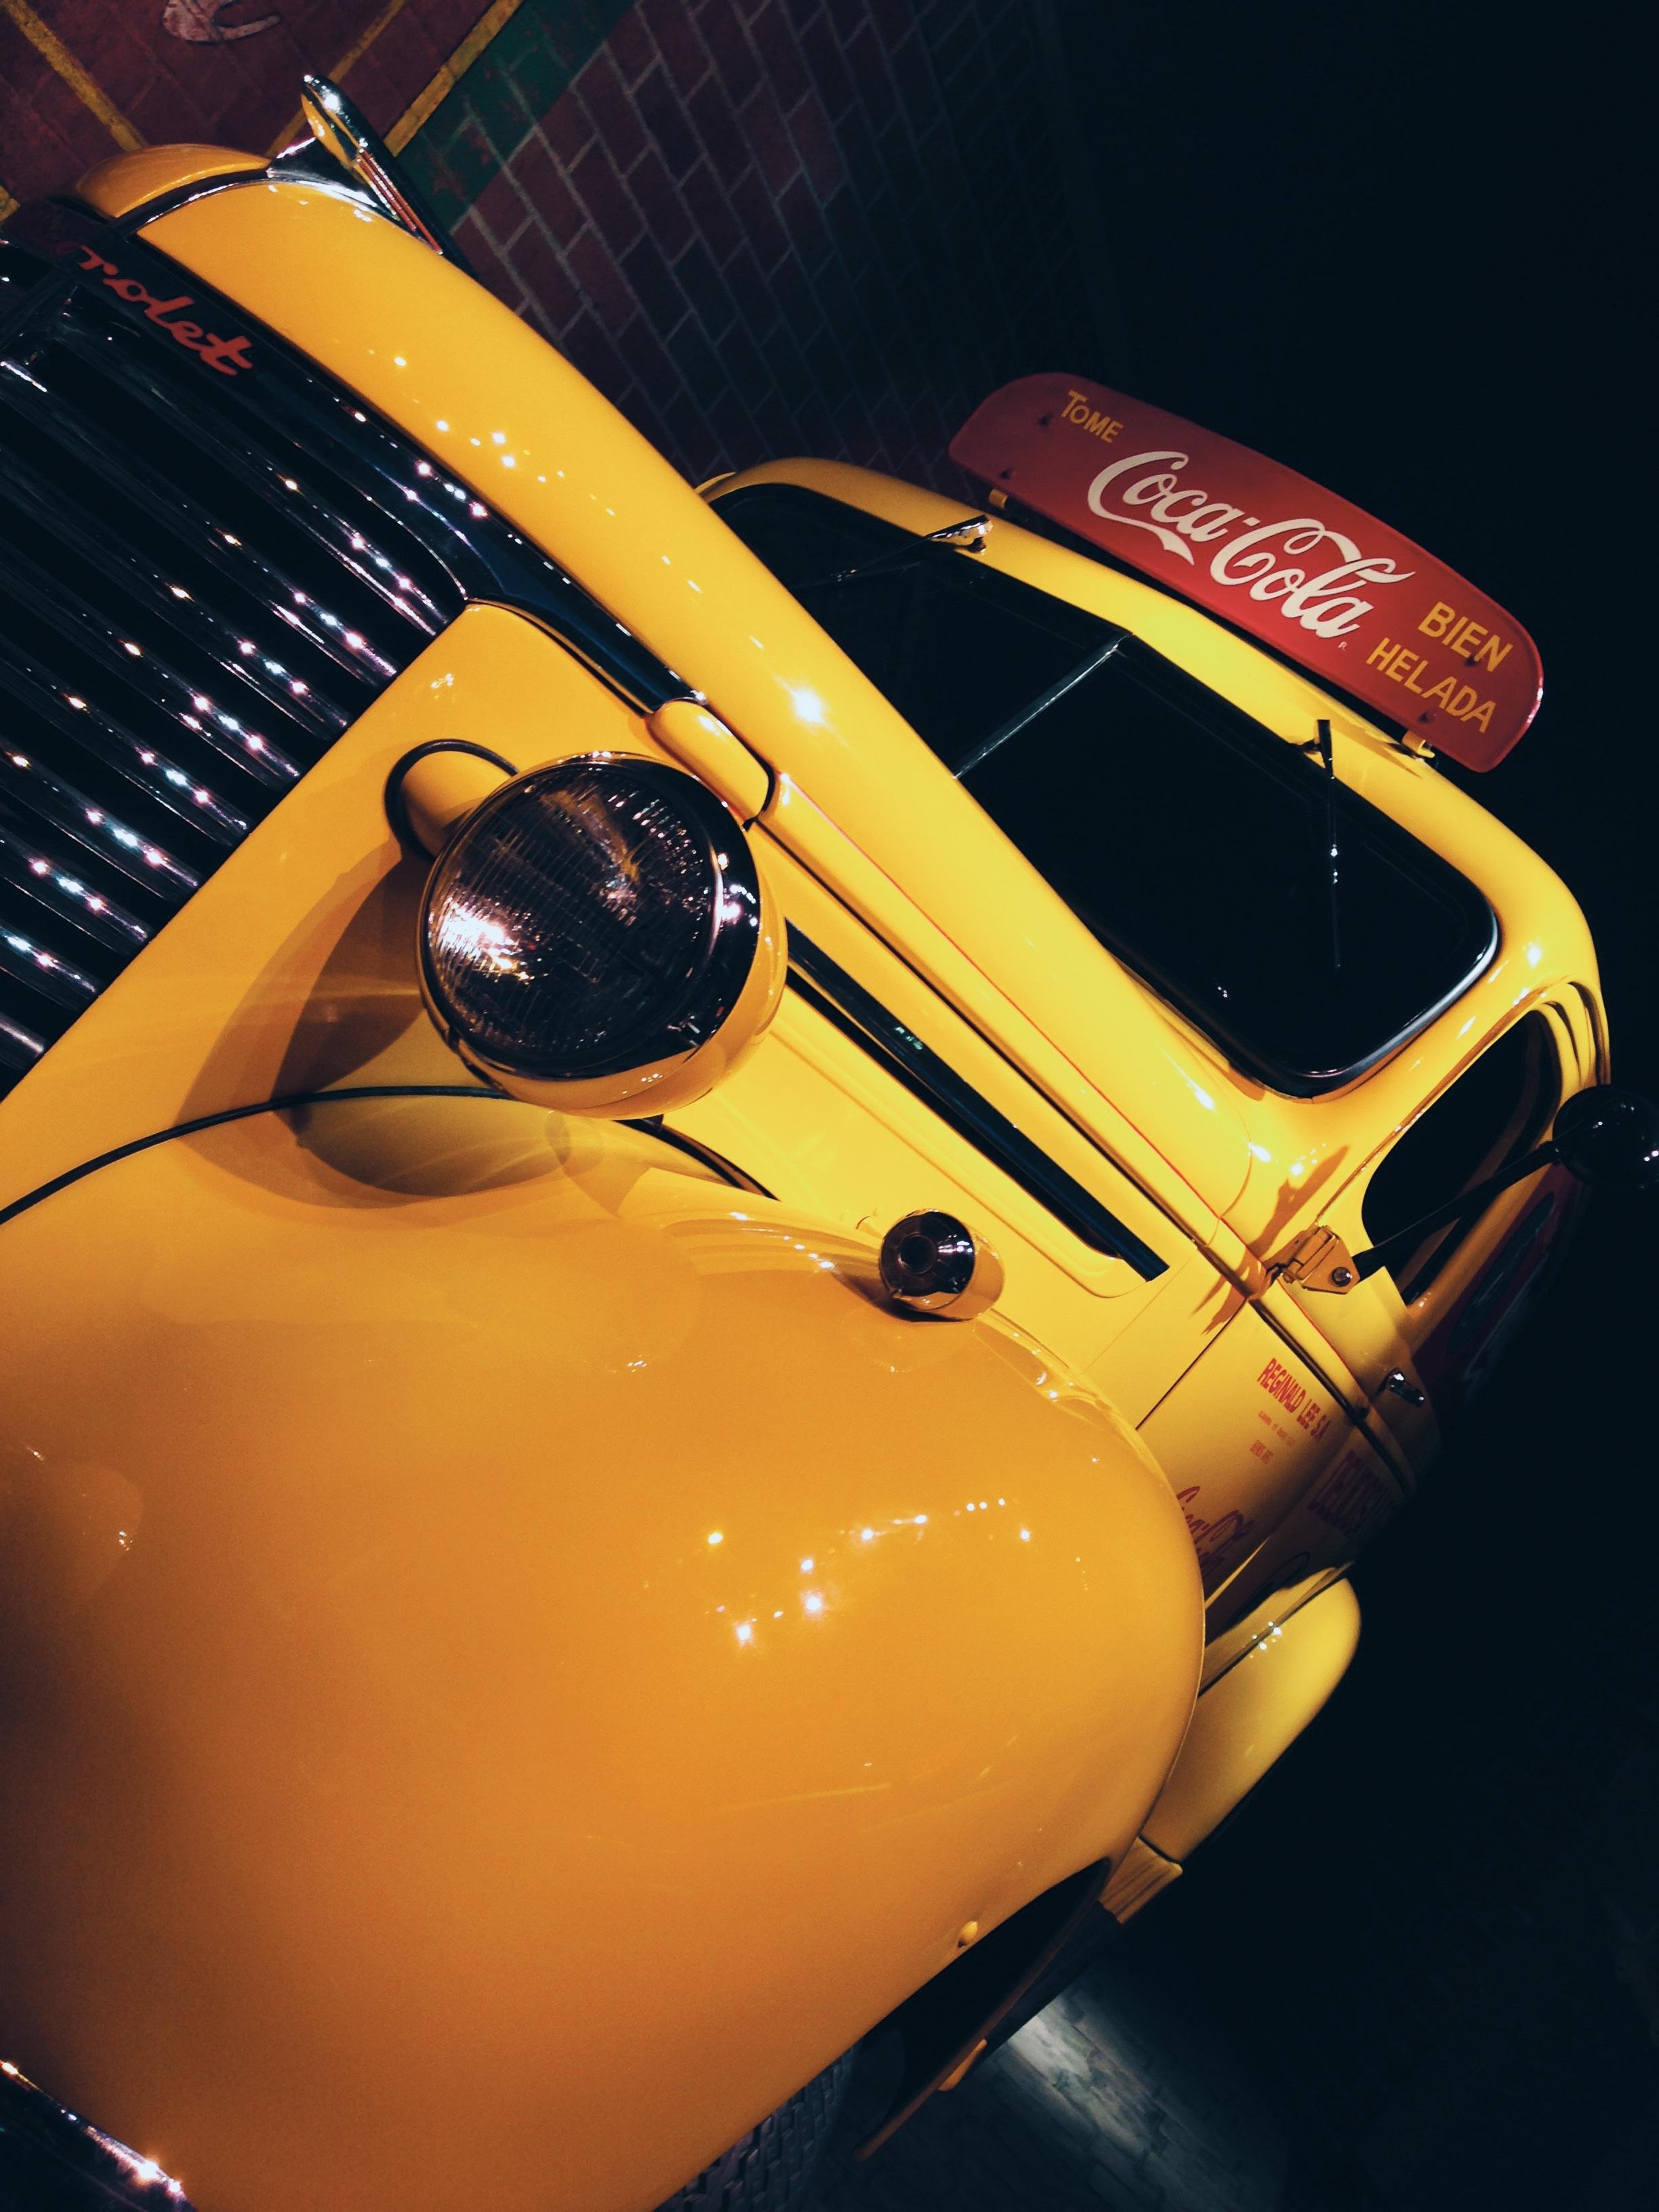 Free Images Yellow Sports Car Vintage Car Supercar Classic Model Car Auto Show Land Vehicle Automobile Make Automotive Design Performance Car 2448x3264 22139 Free Stock Photos Pxhere